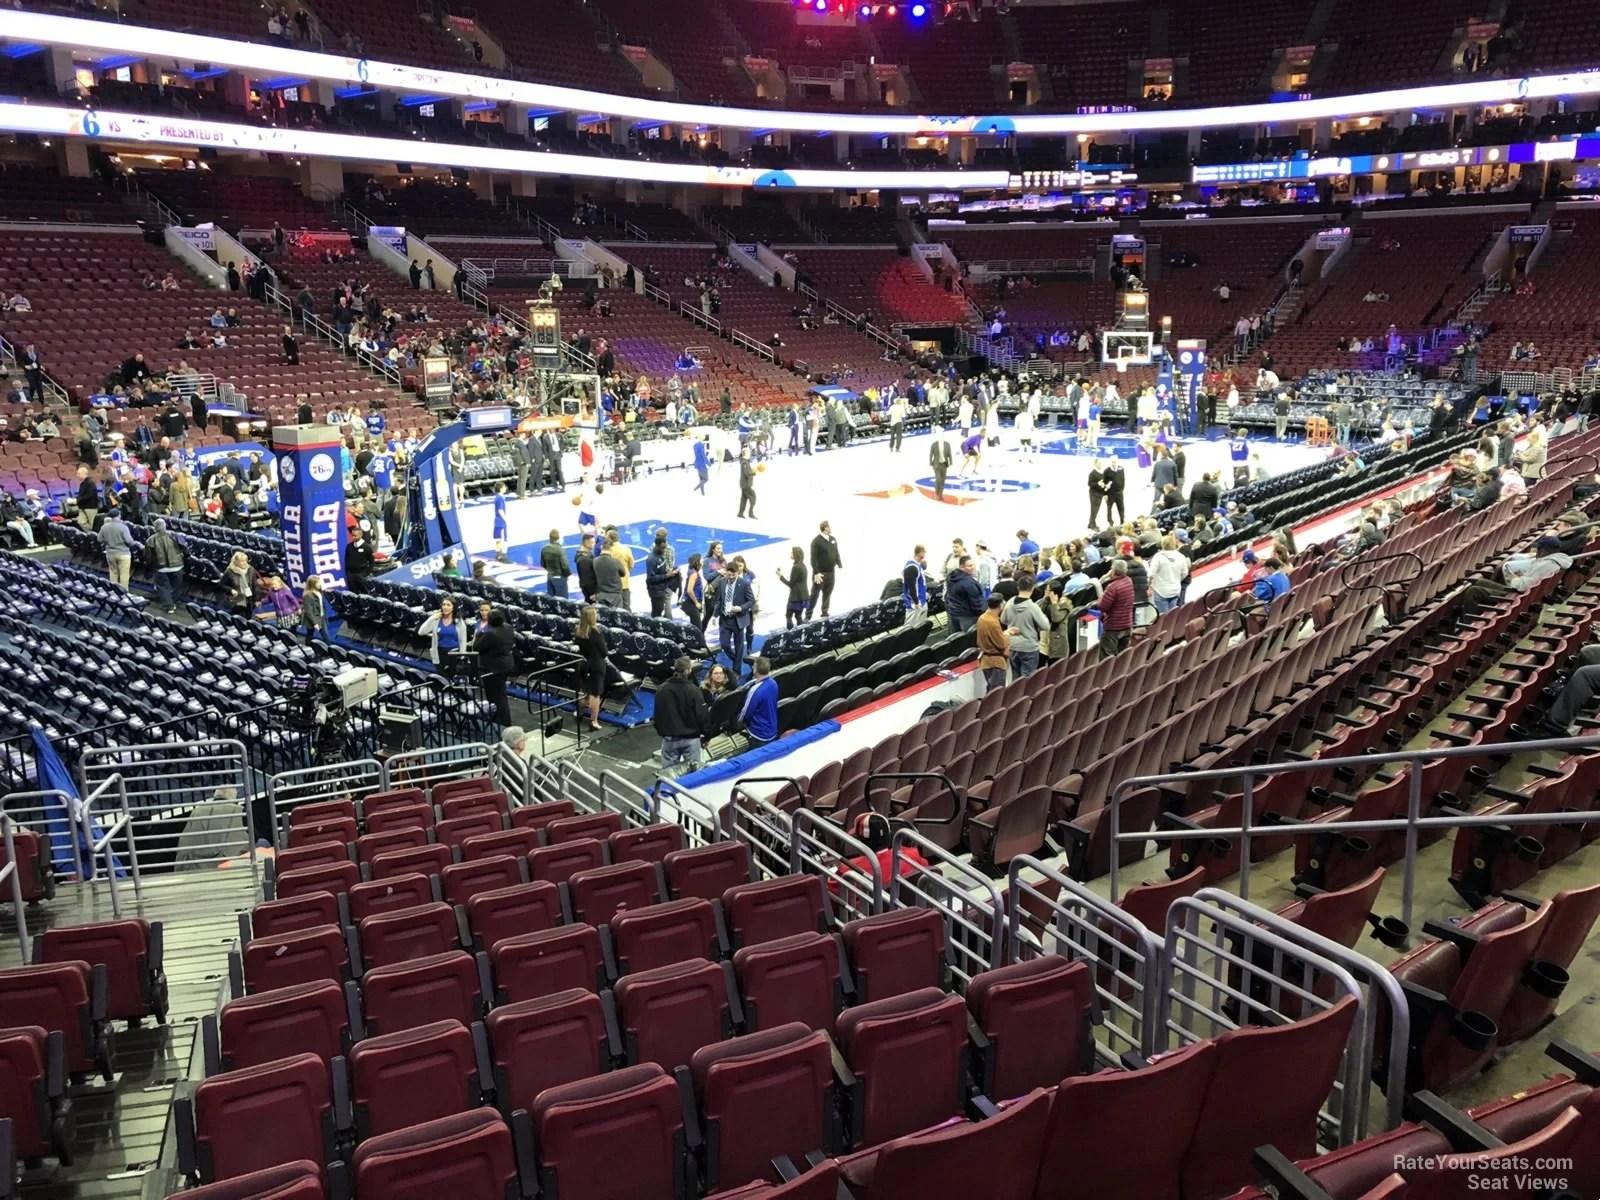 Charlotte Bobcats Courtside